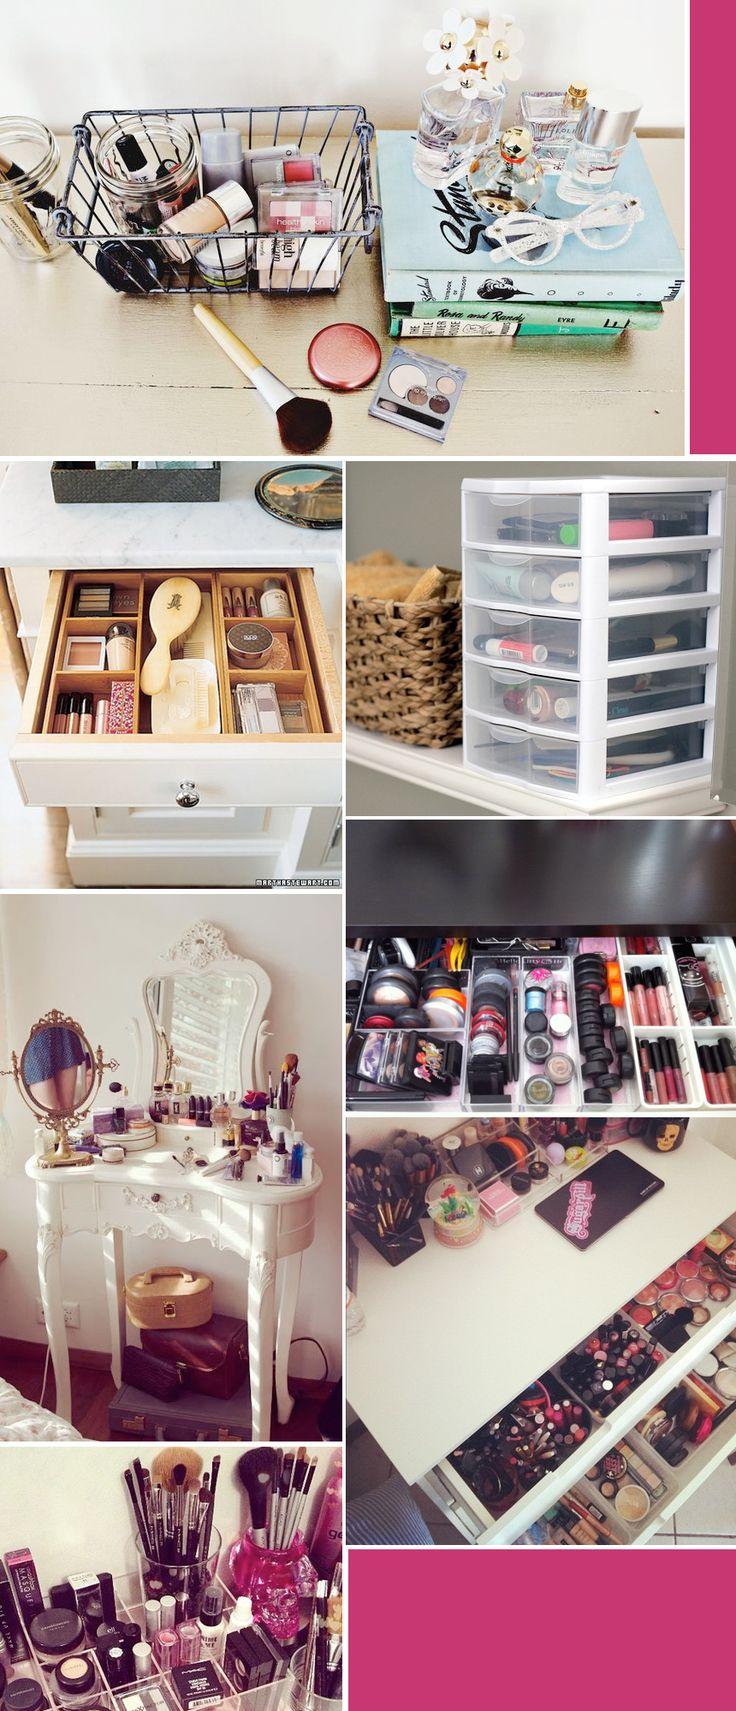 Make up and toiletries storage